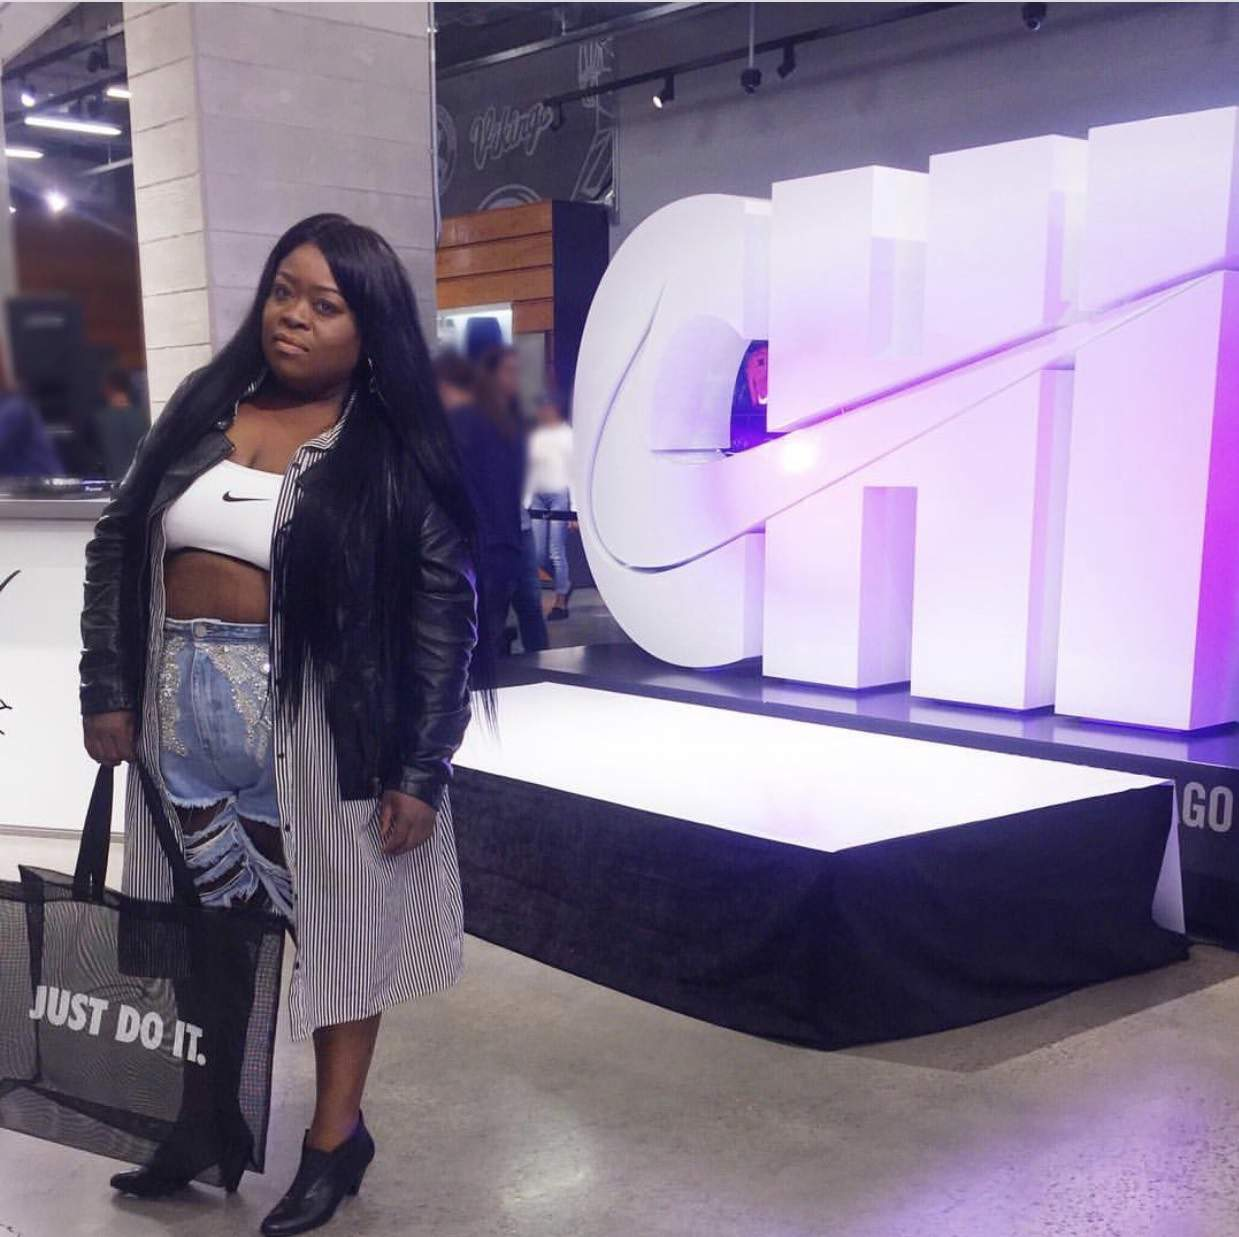 Plus size fashion blogger spotlight: The Fat Girl of Fashion